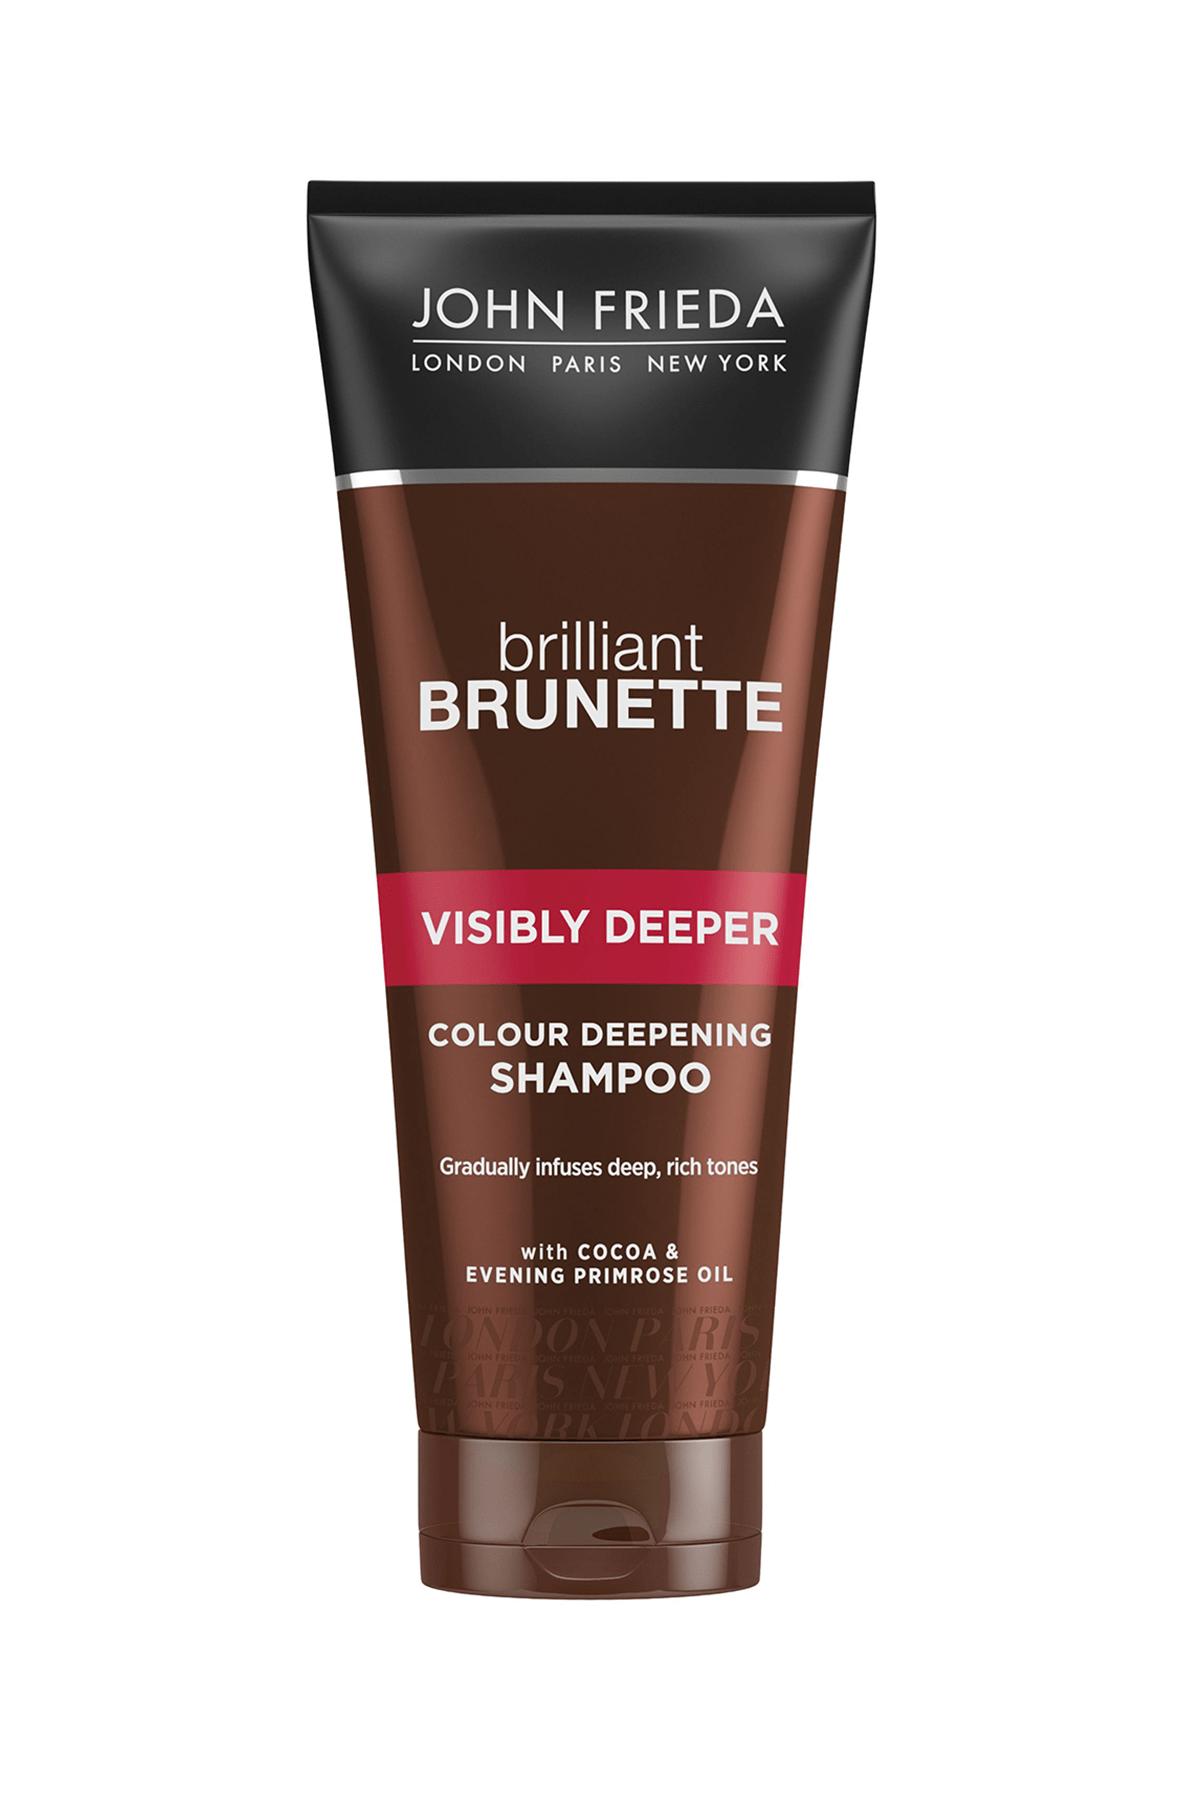 John Frieda Brilliant Brunette Visibly Deeper Şampuan 250ml 1